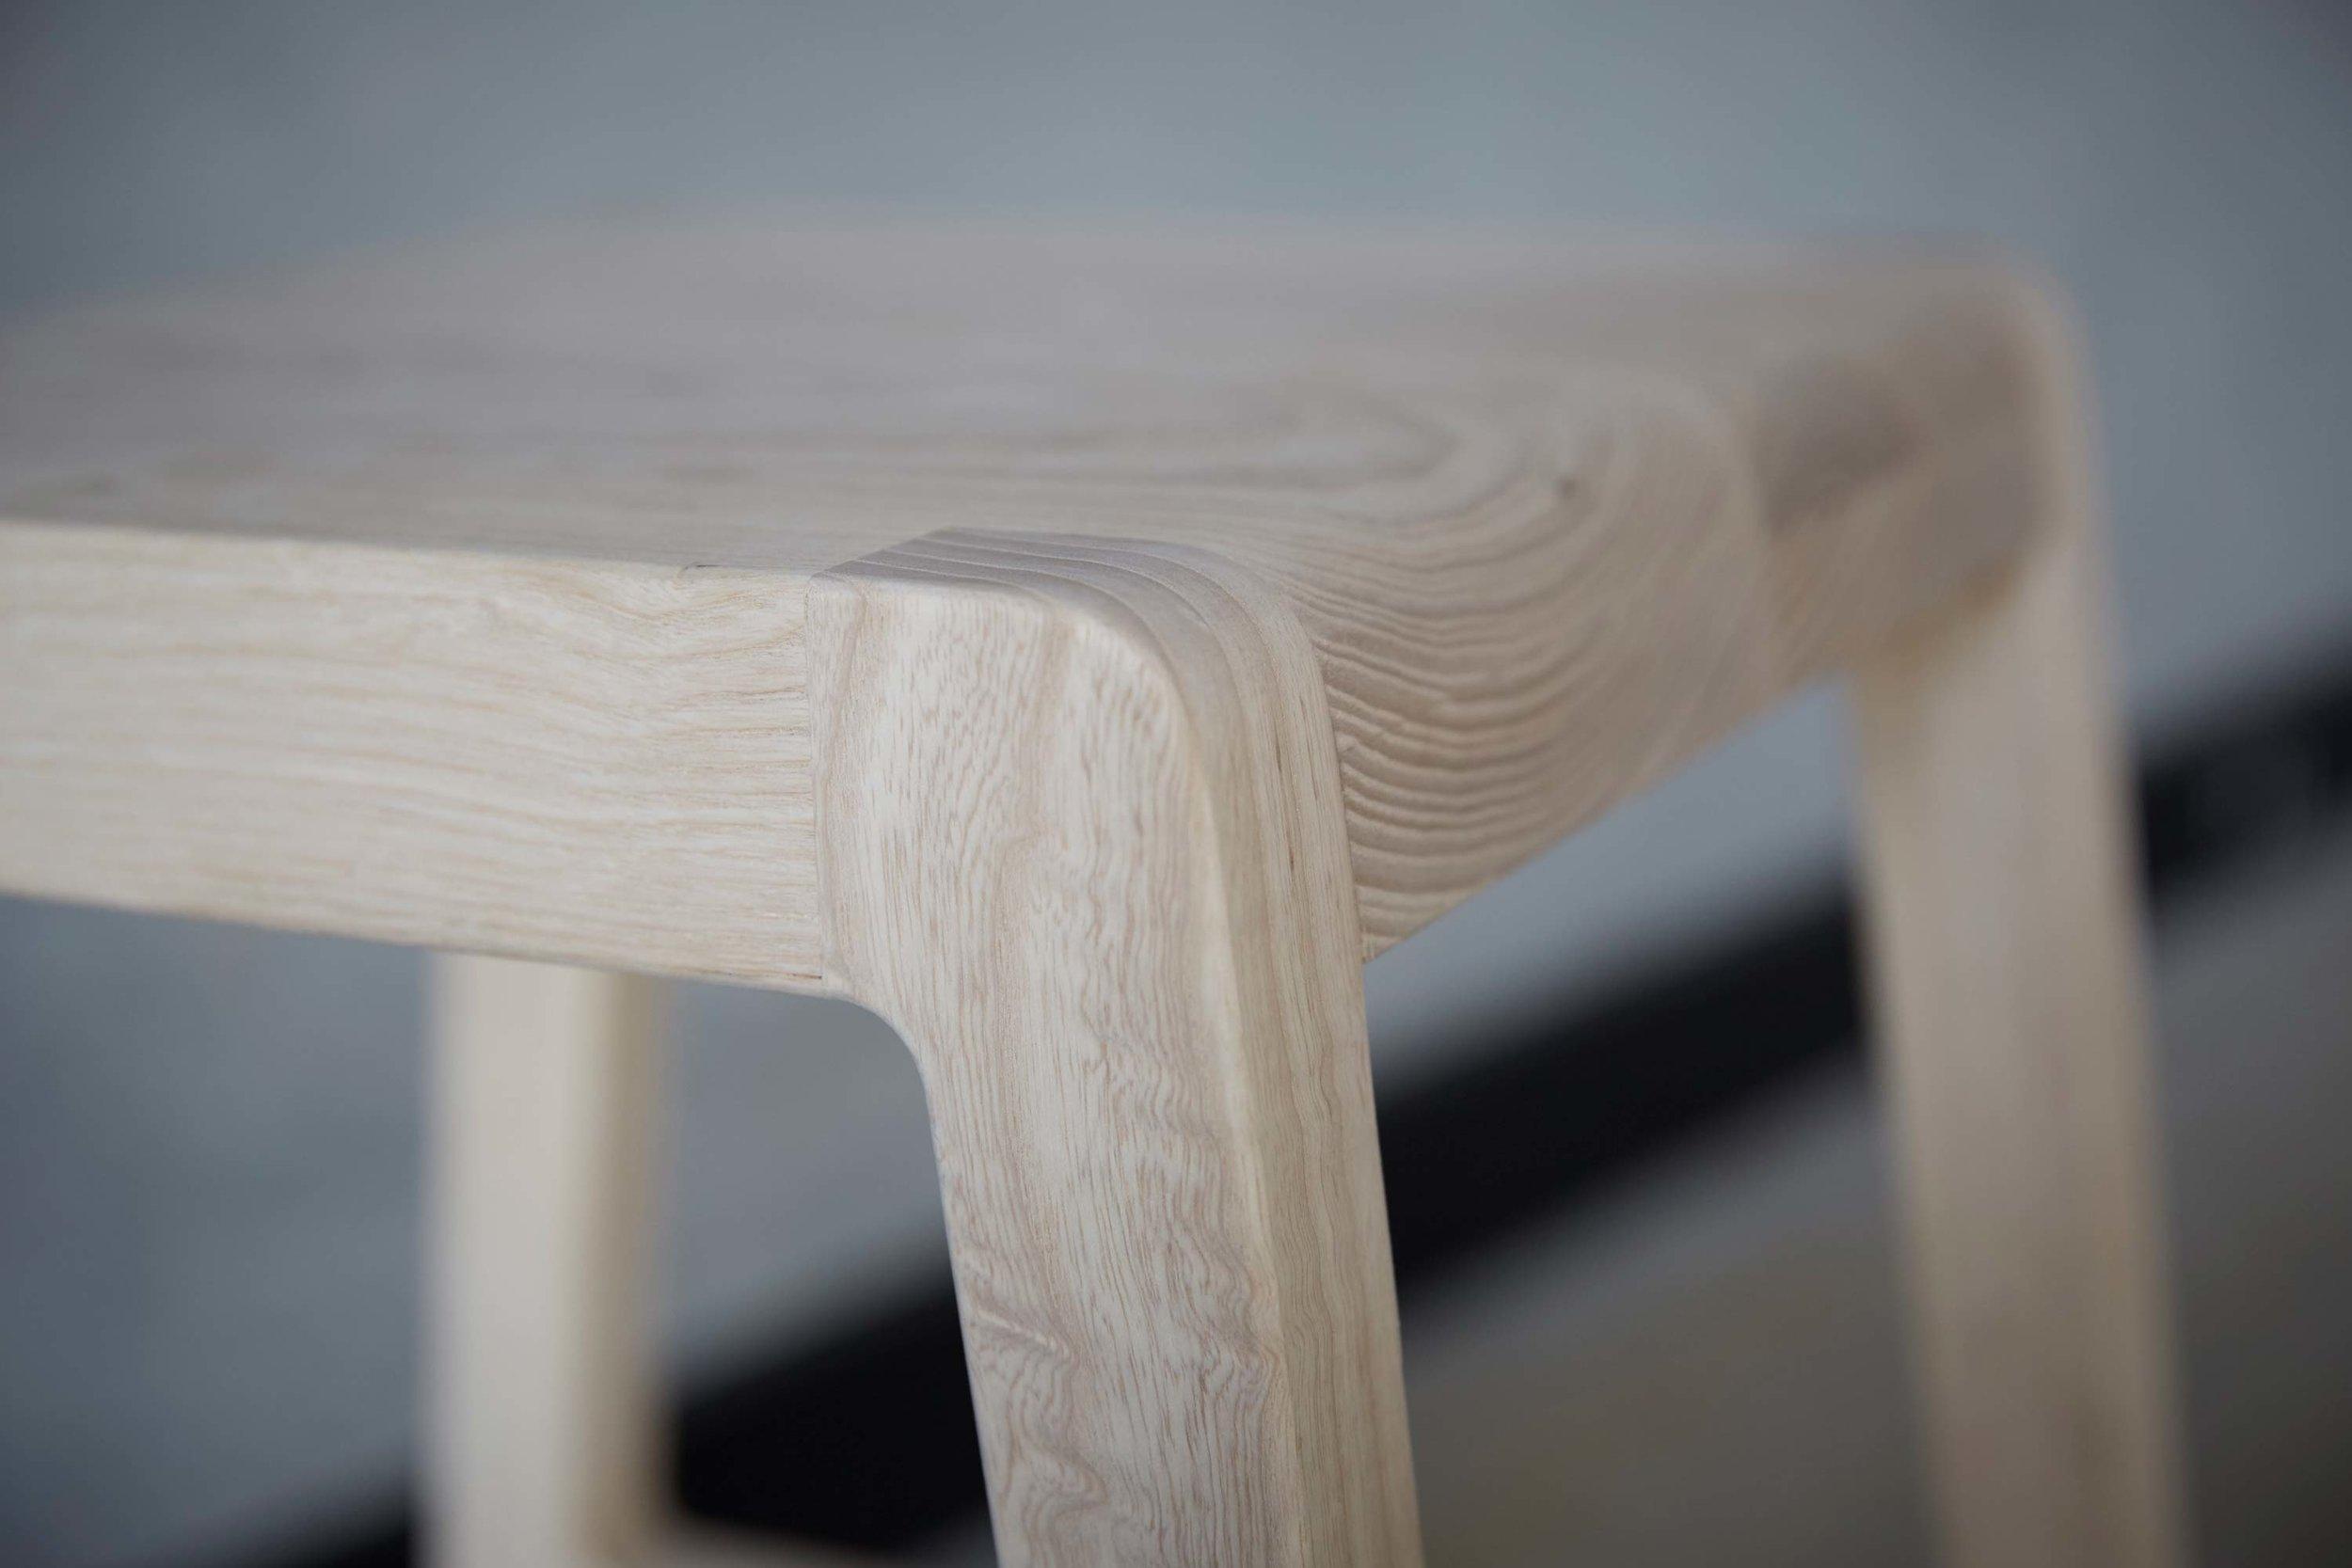 Willox Barstools by Mast Furniture. Modern, handmade furniture.